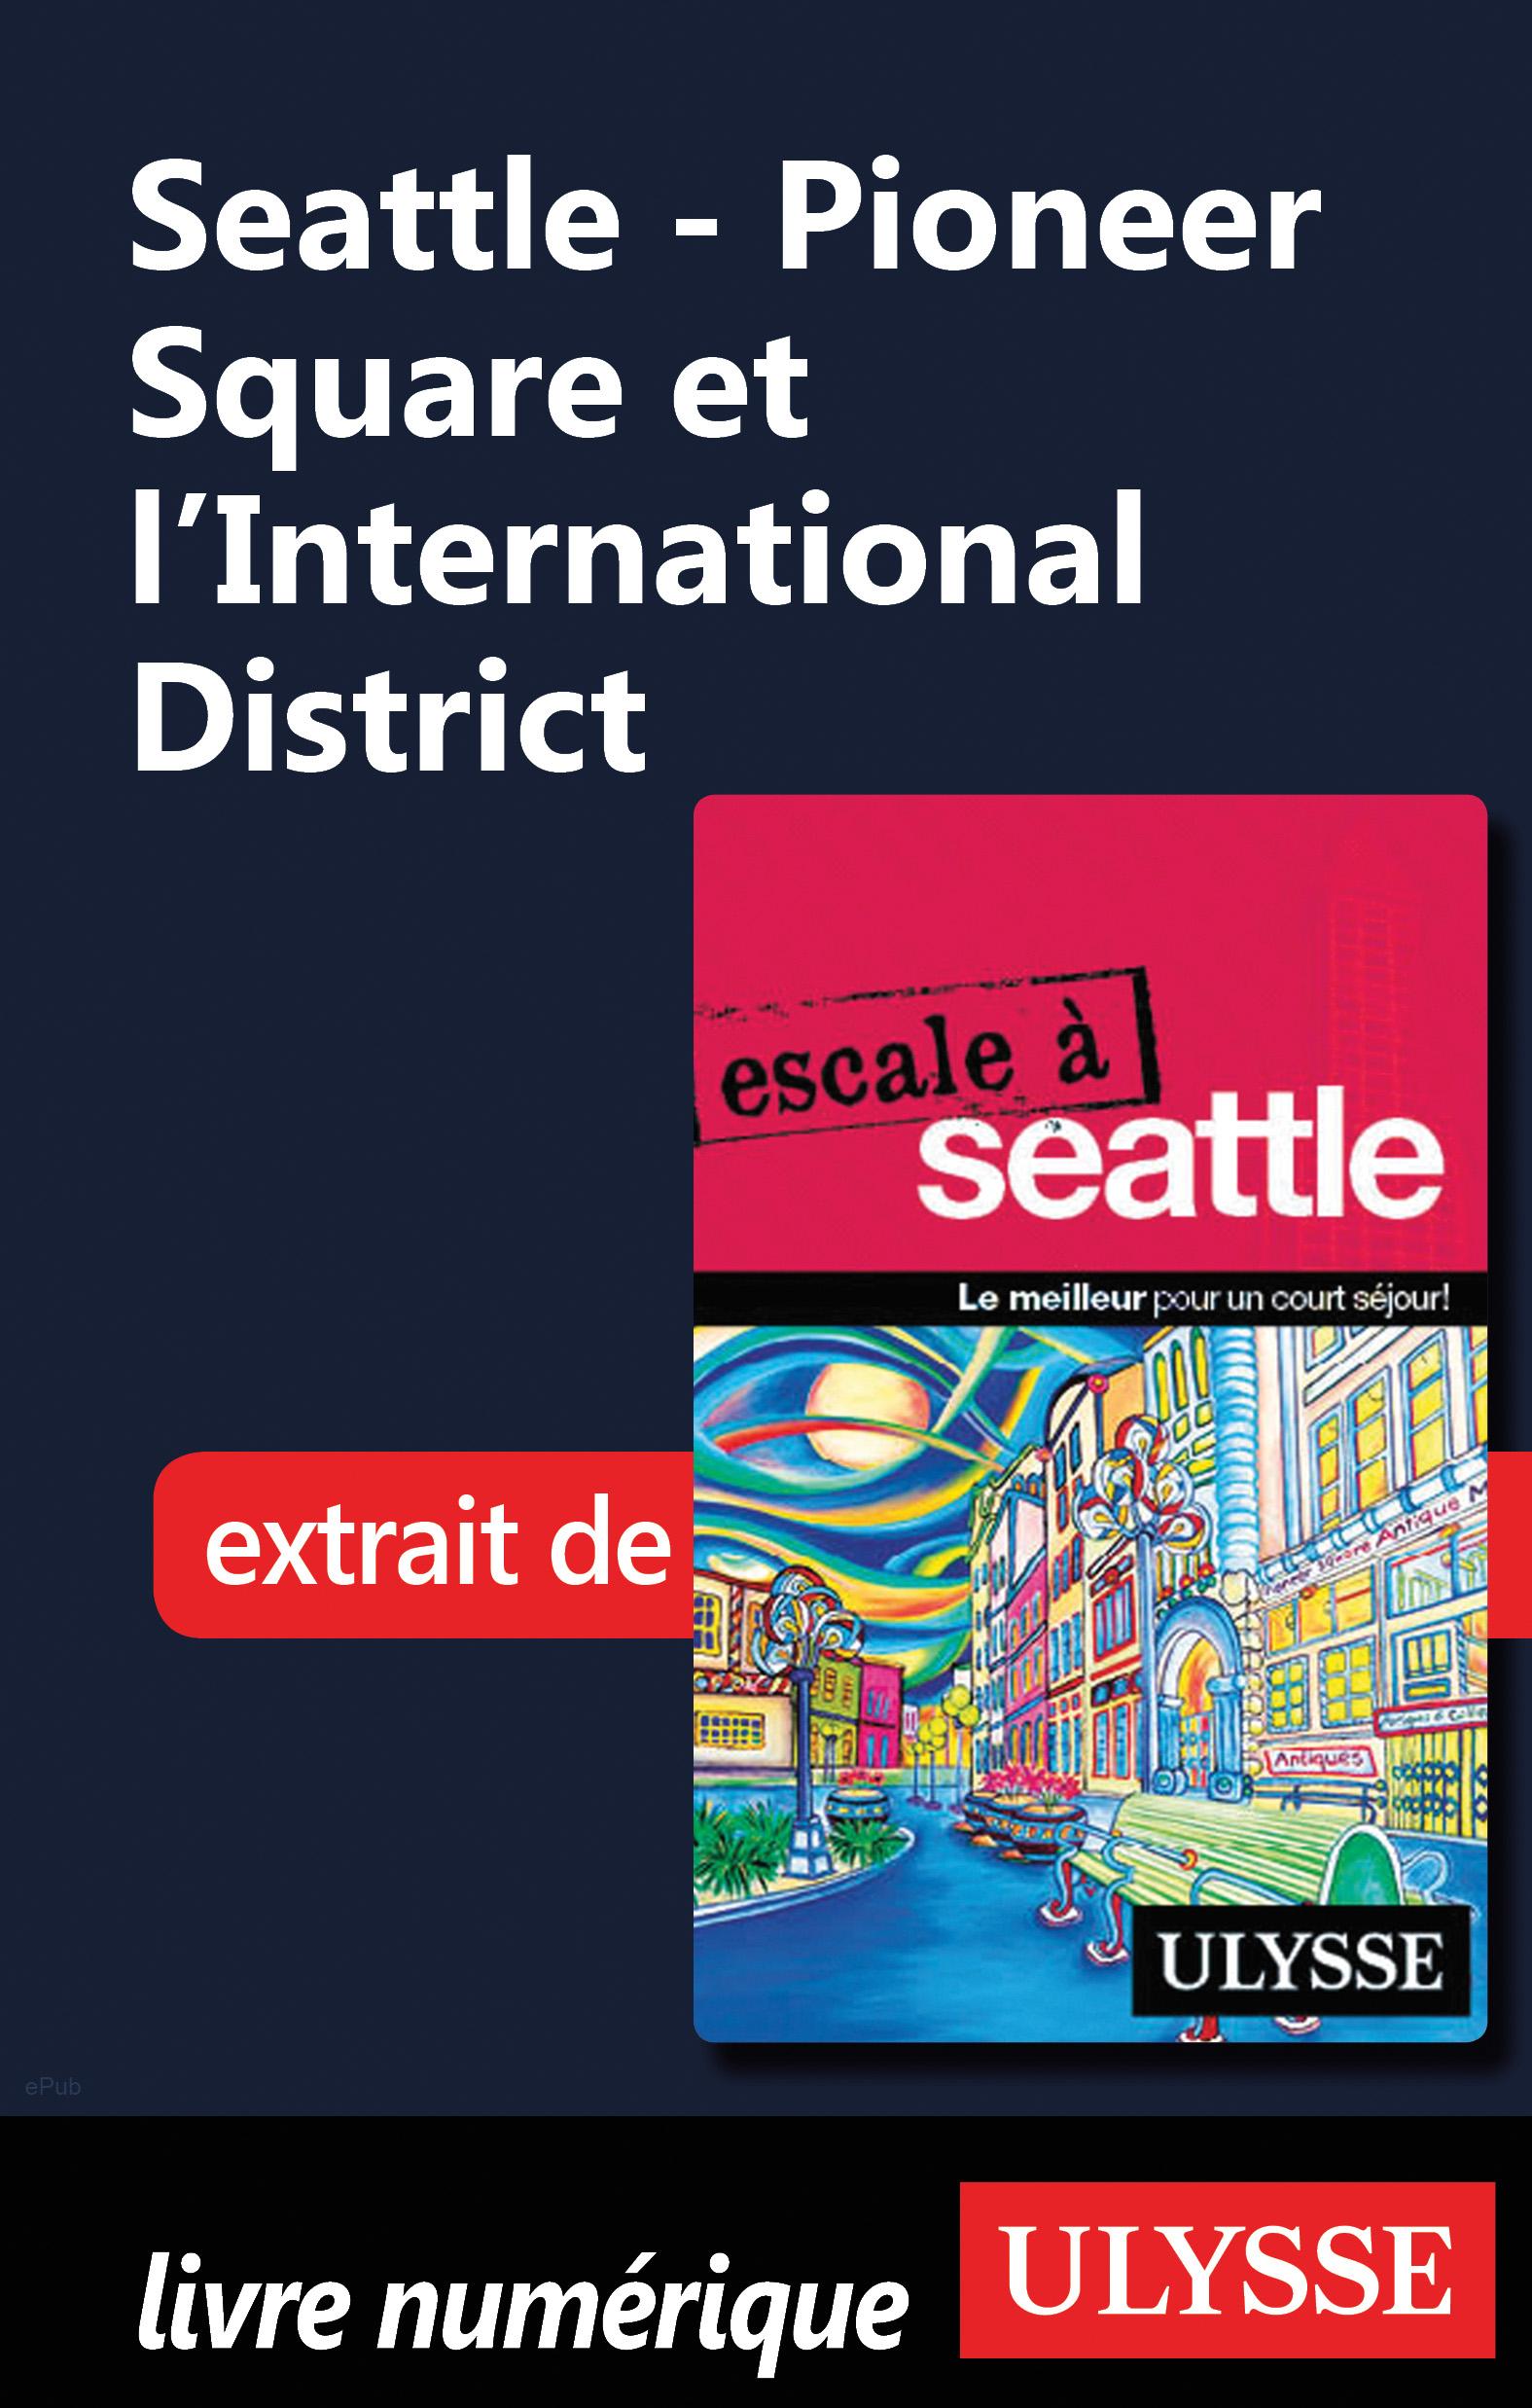 Seattle - Pioneer Square et l'International District